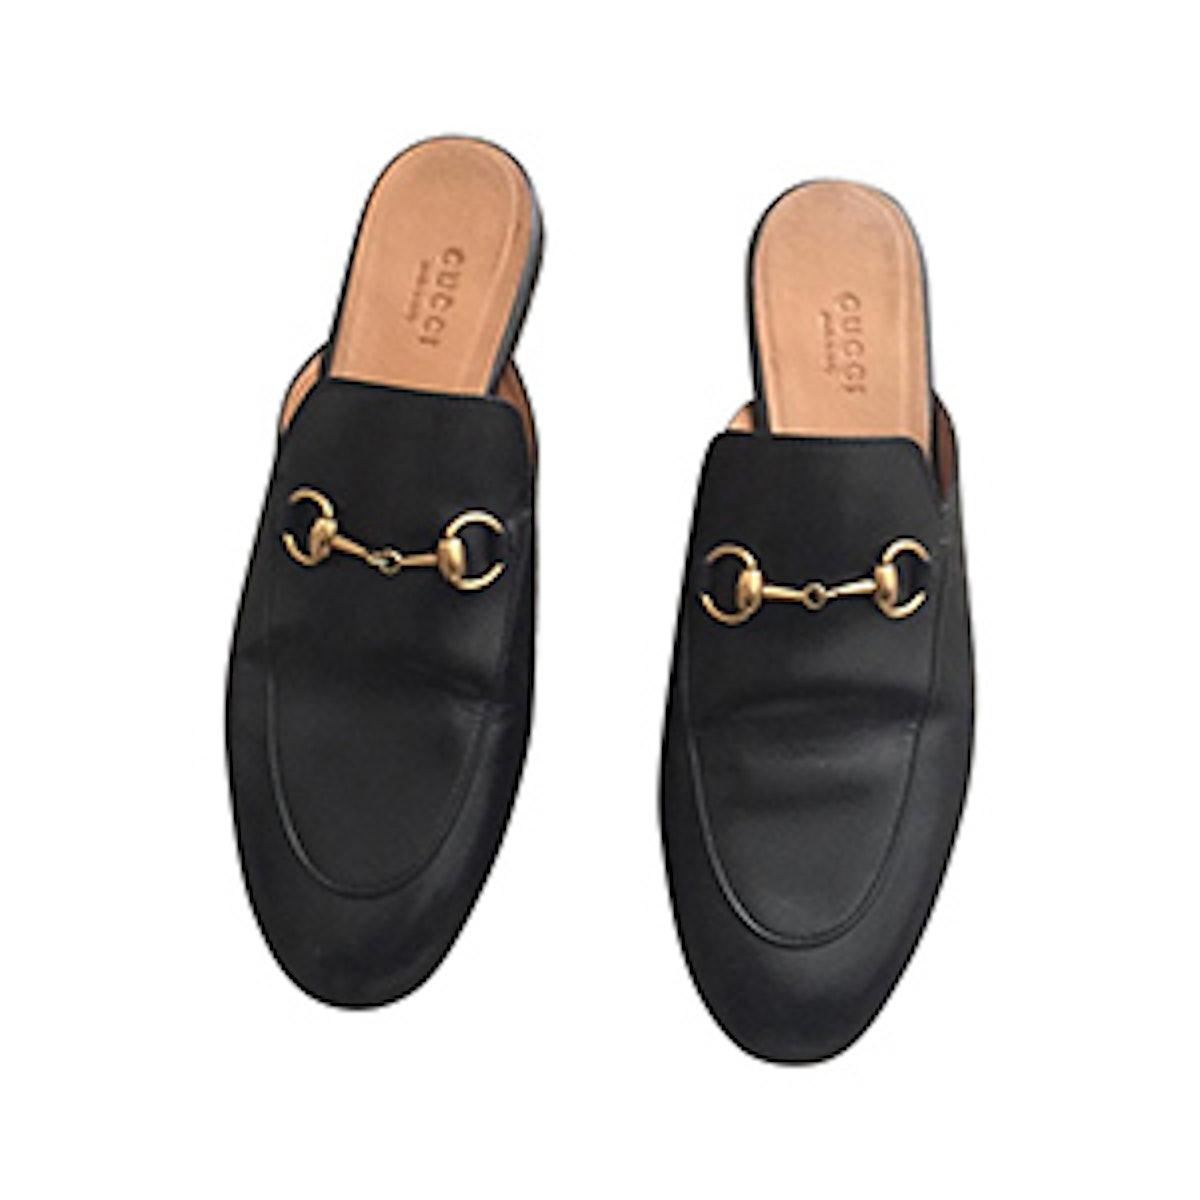 Horsebit Princetown Leather Classic Flats